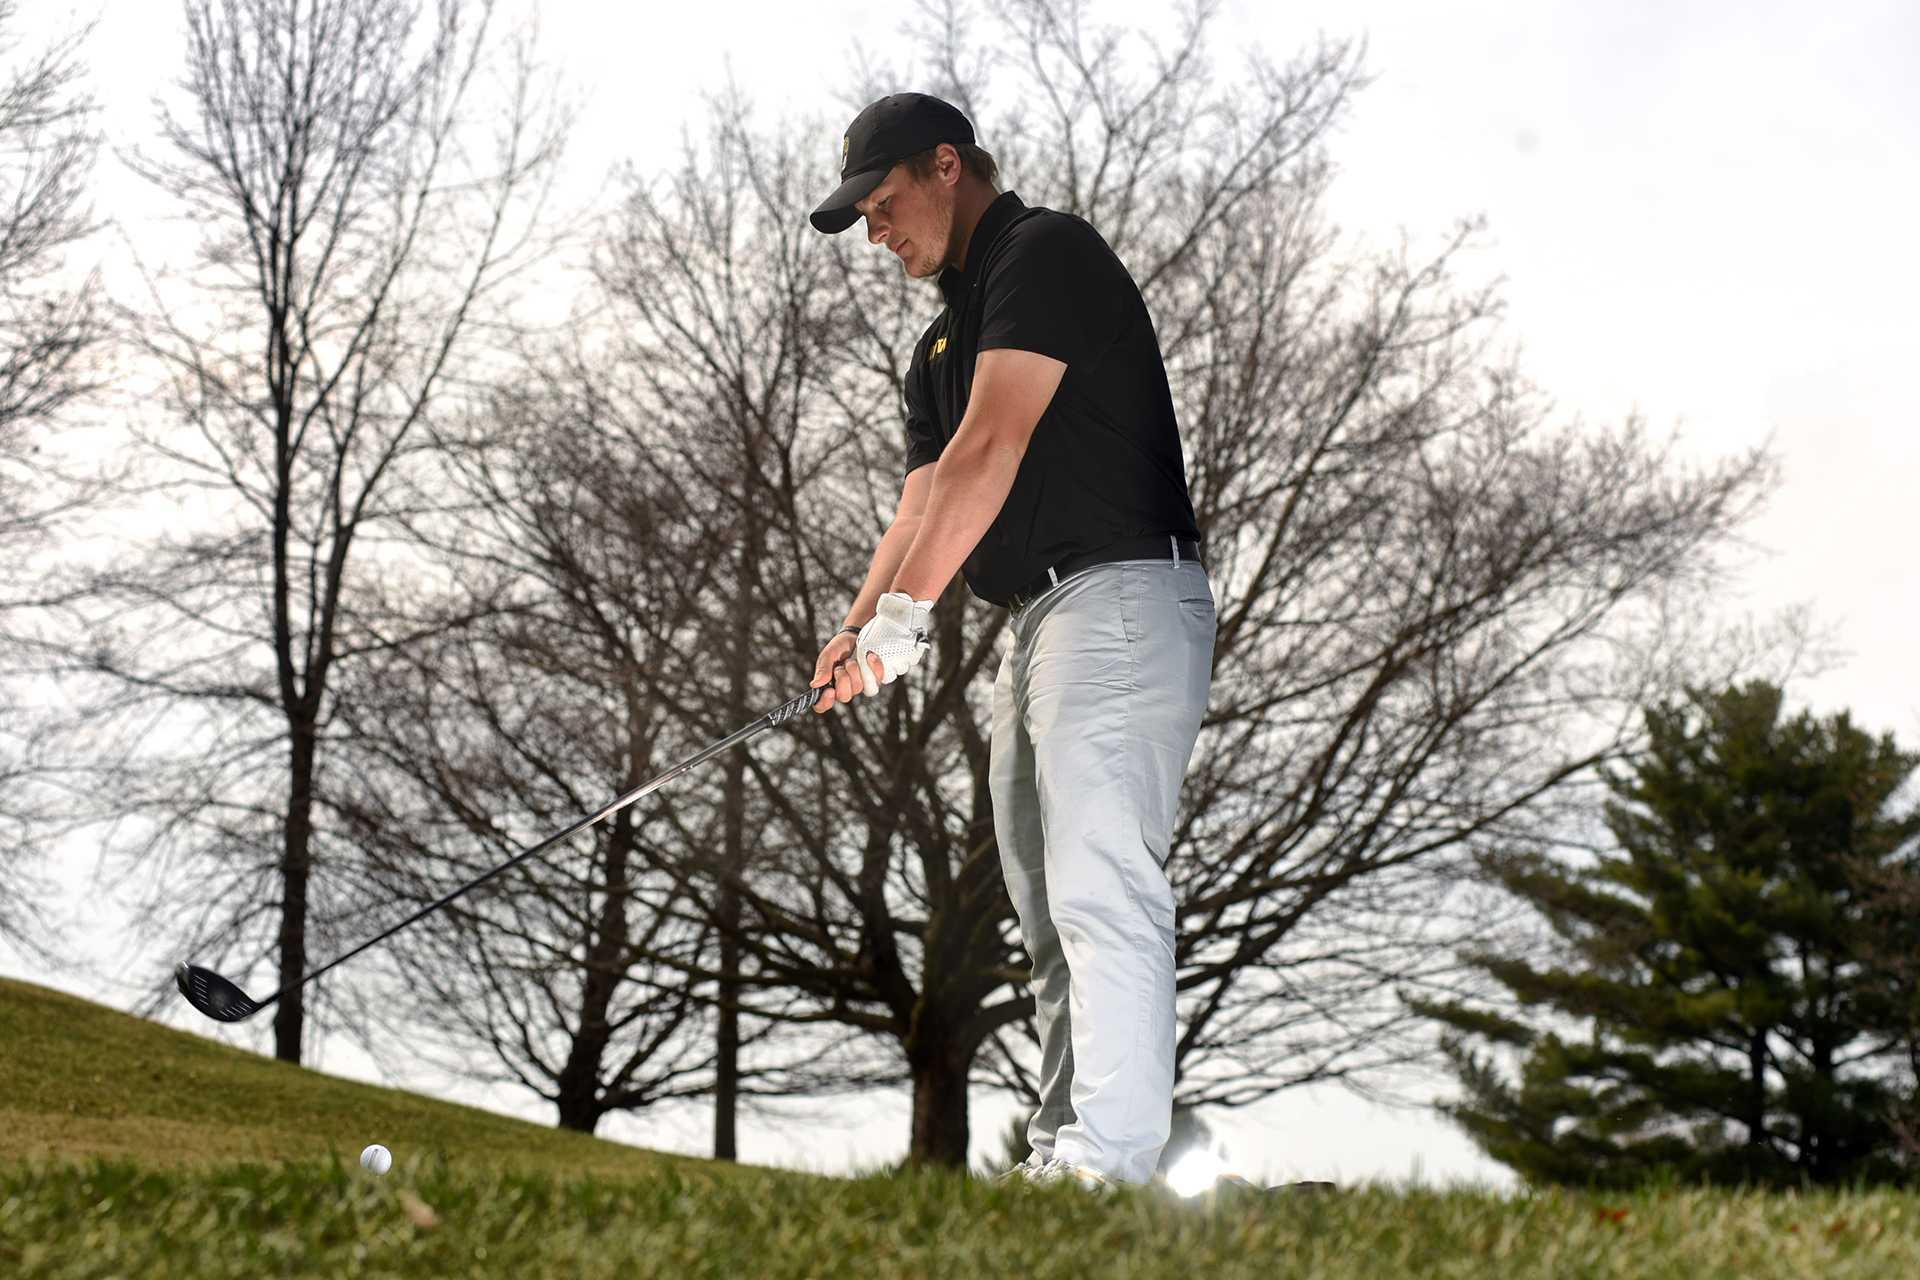 Hawkeye golf takes on Big Ten field